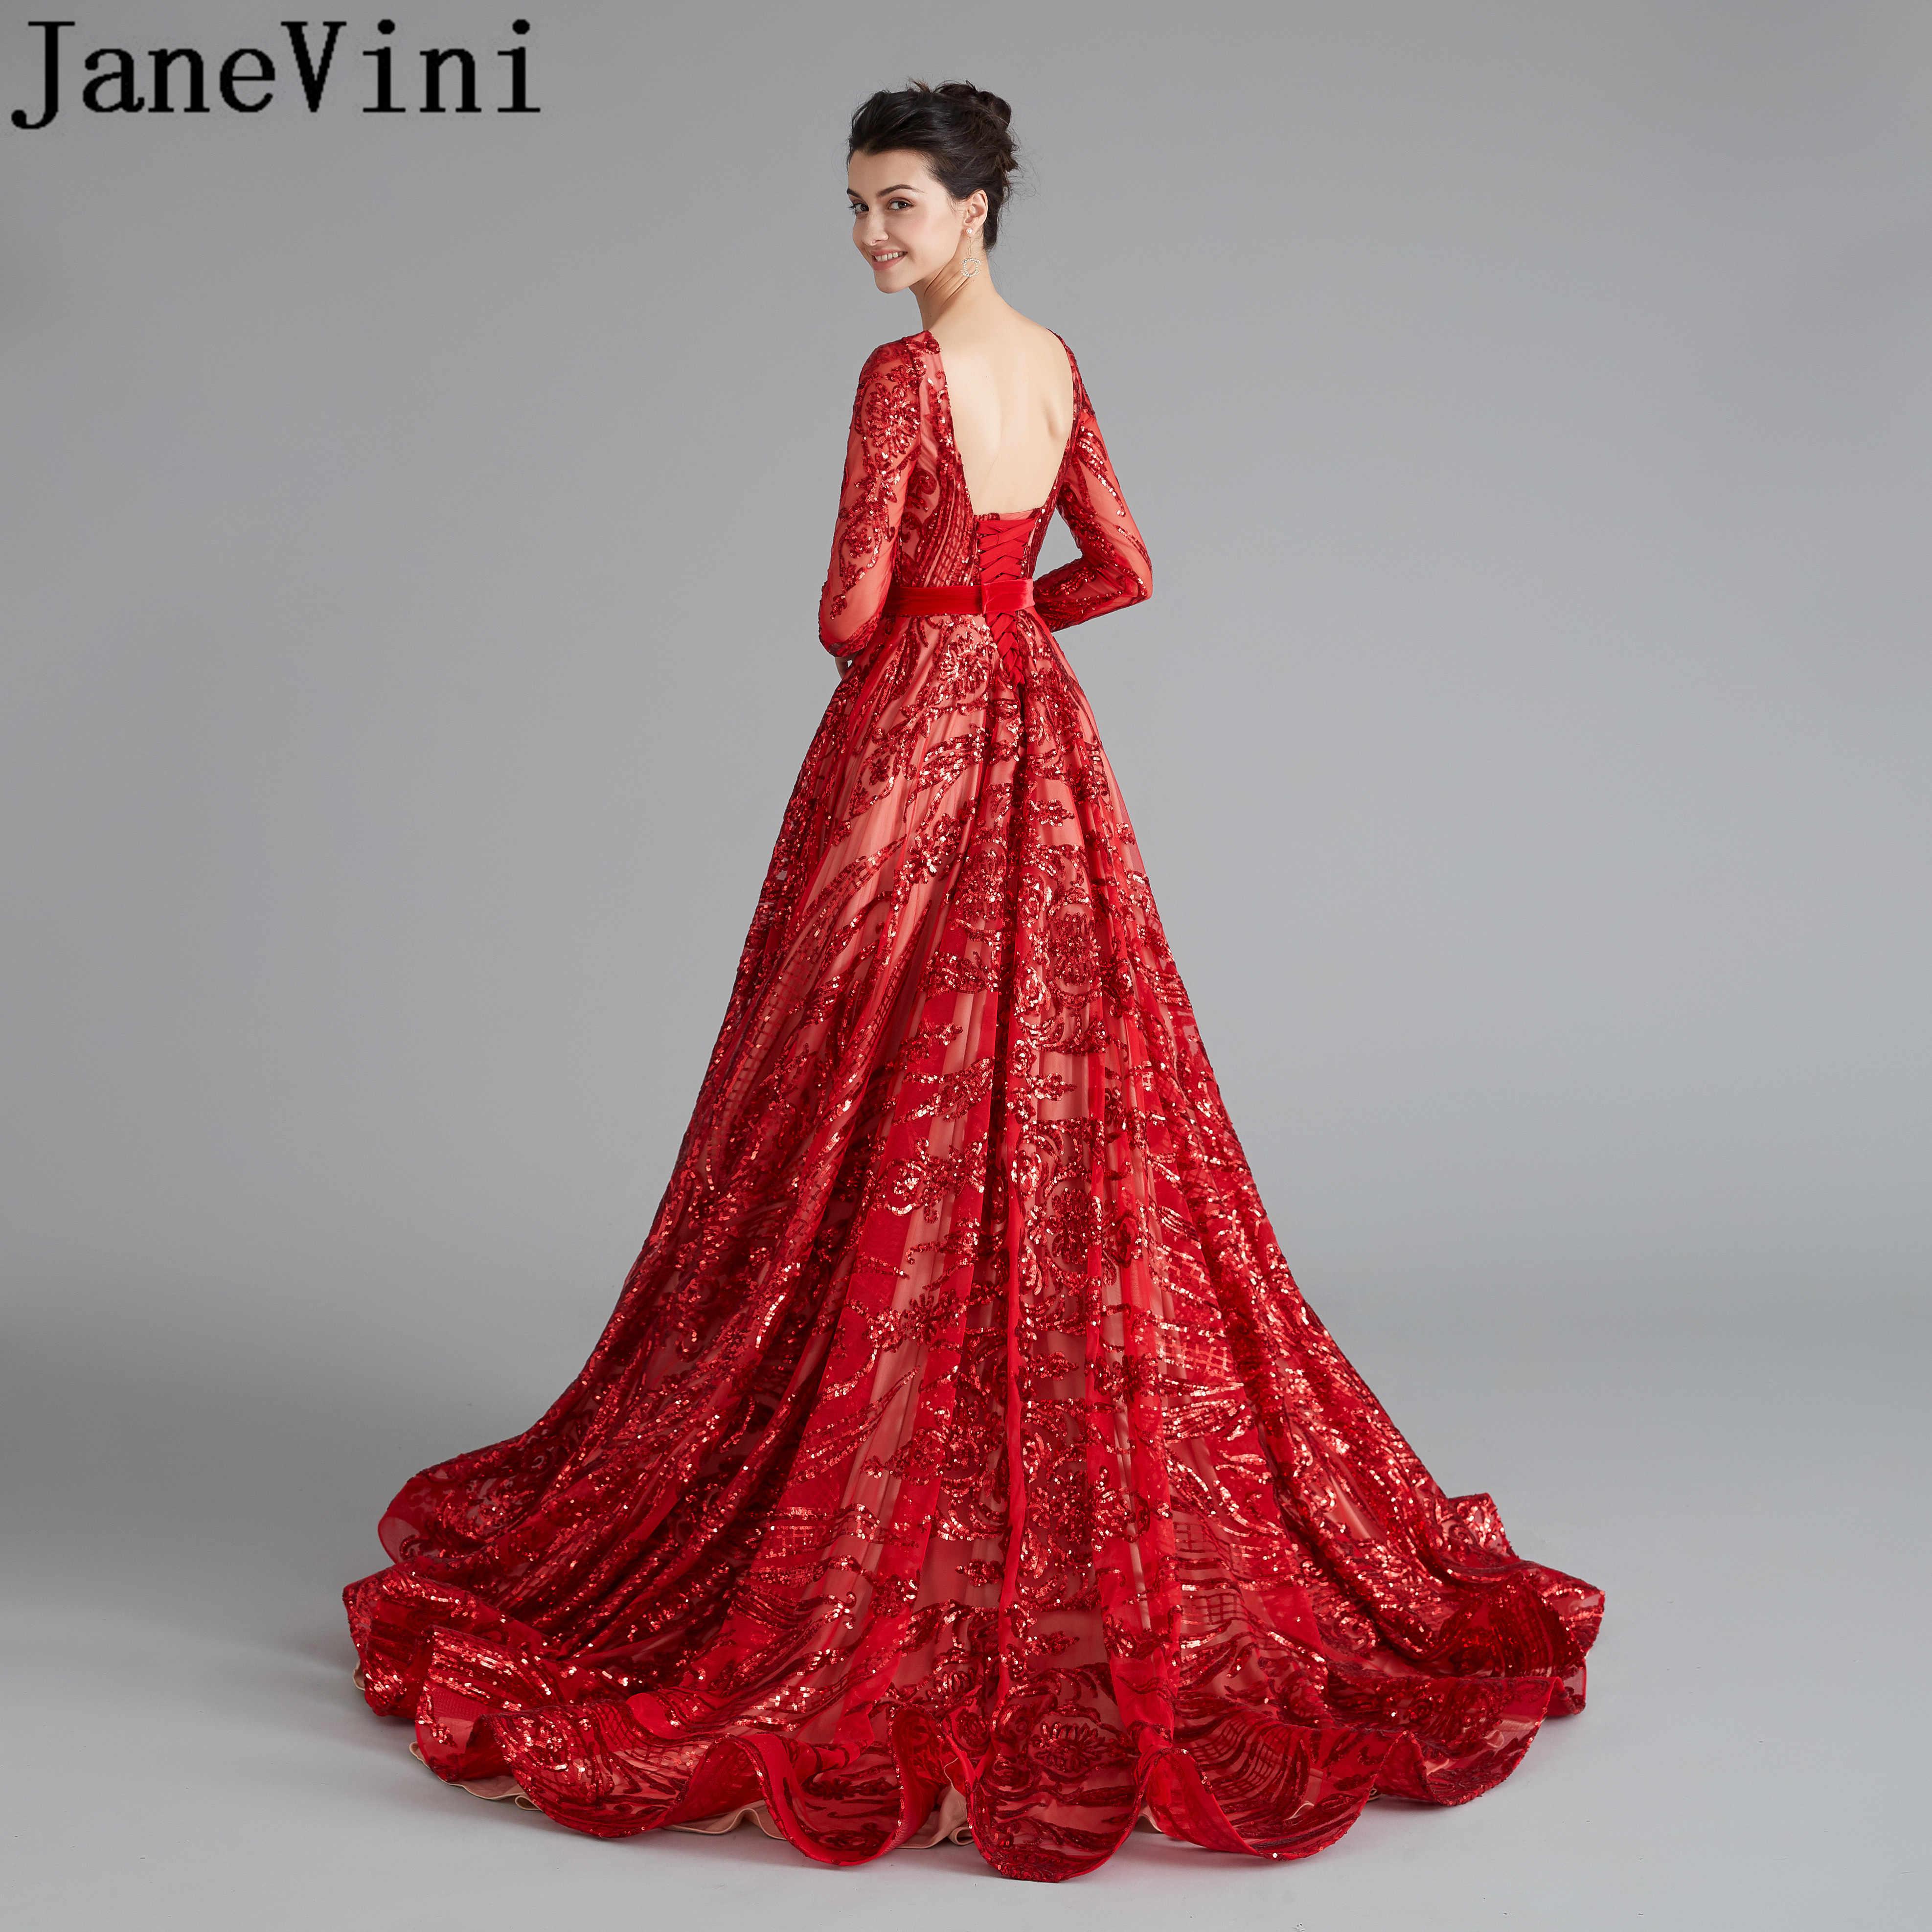 JaneVini Arabic Red Evening Prom Dresses 20 Bling Bling Sequined Gala  Party Dress Ballkleider Lang Luxury Open Back Women Gown